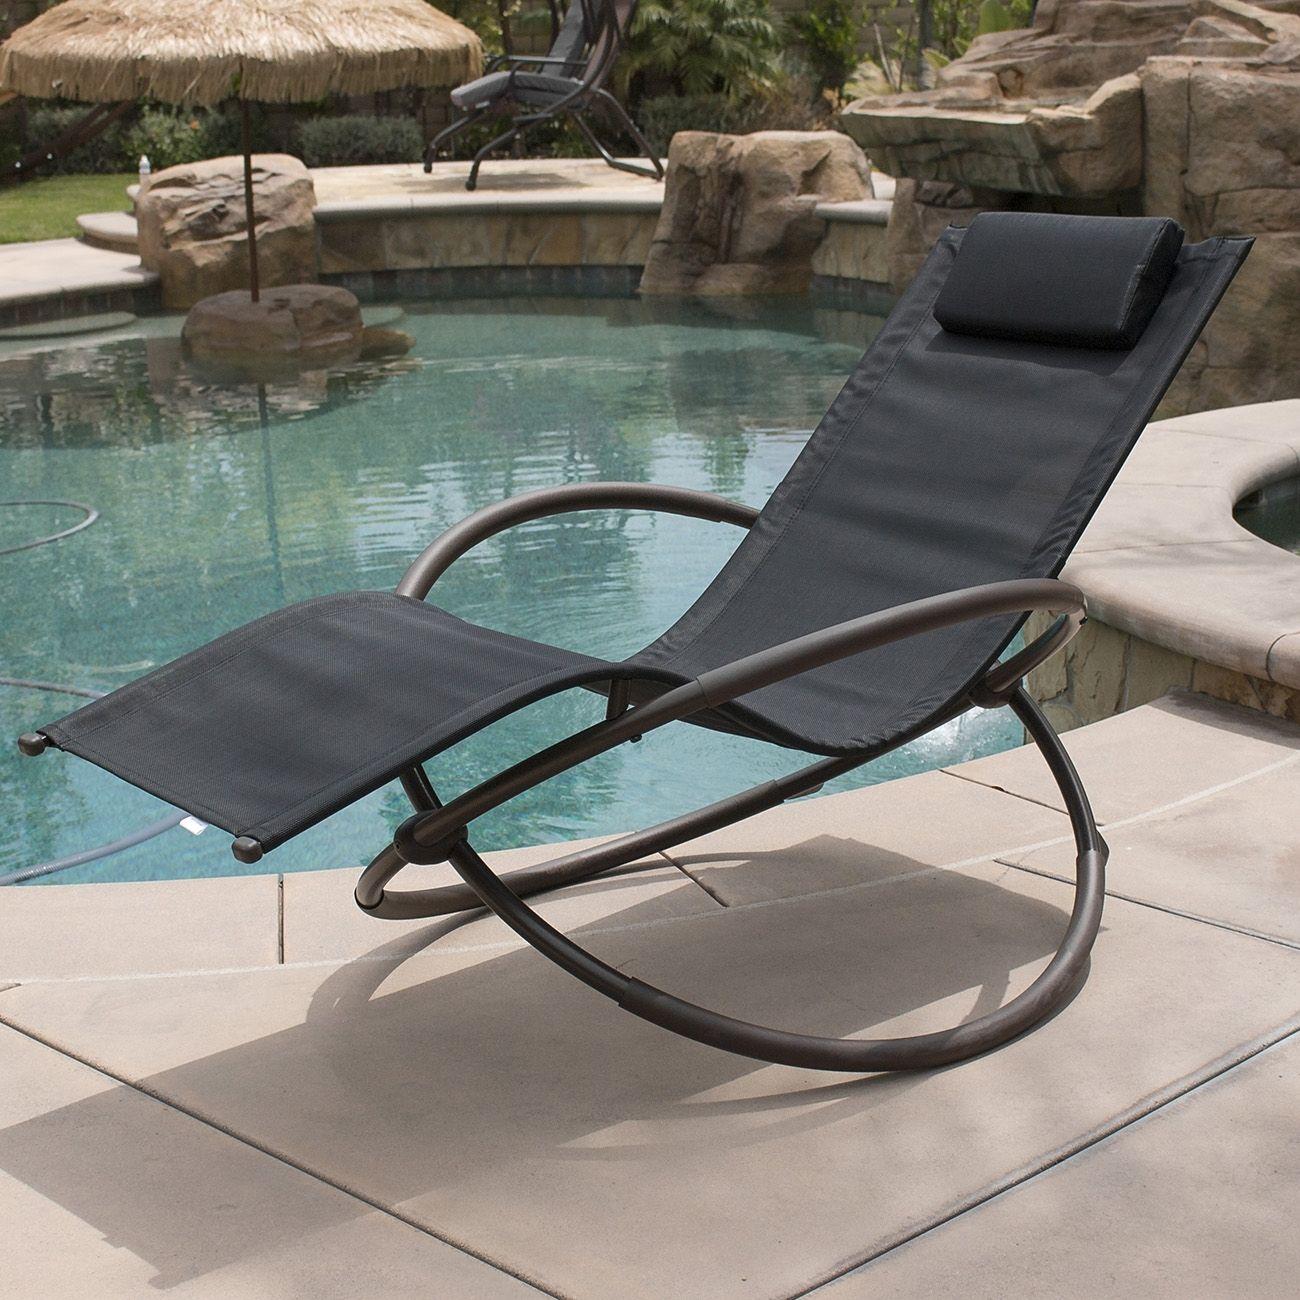 Cleaning teak zero gravity outdoor chair sillas muebles